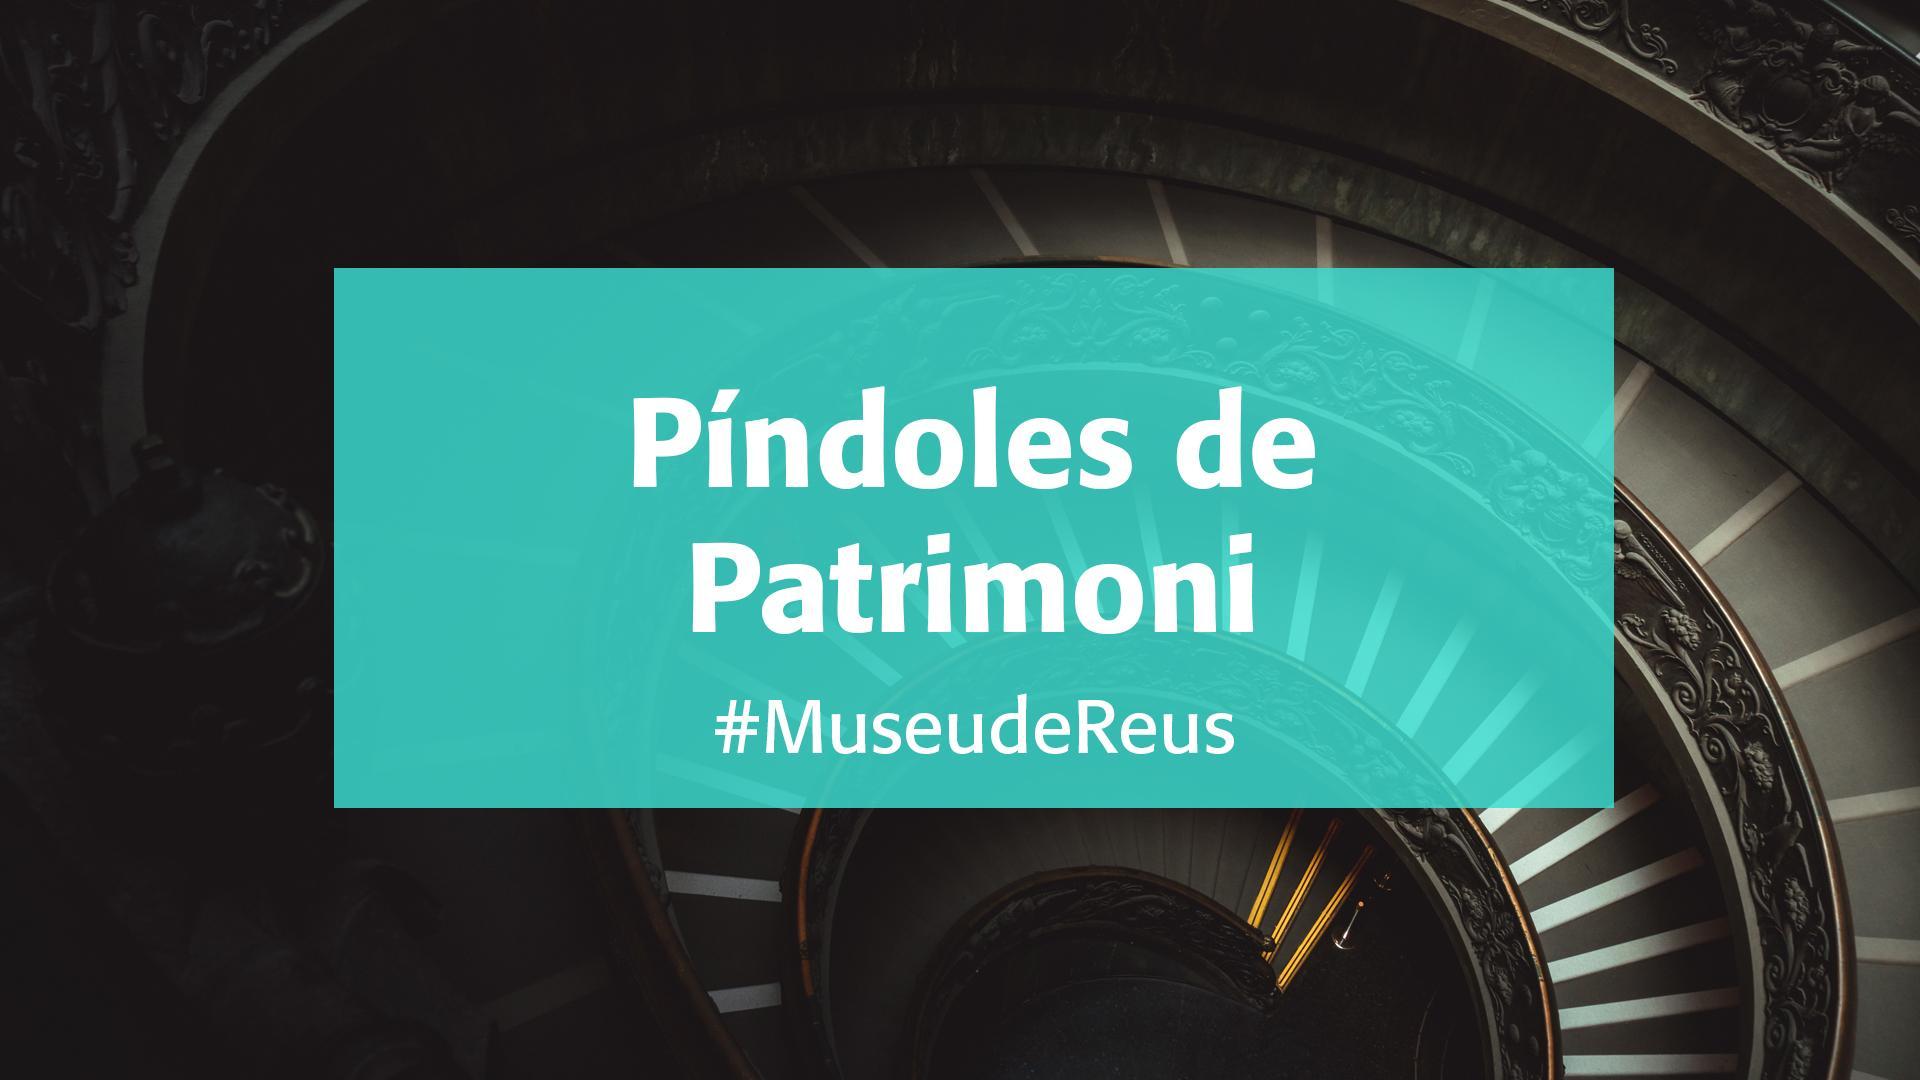 Museu de Reus: Píndoles de Patrimoni